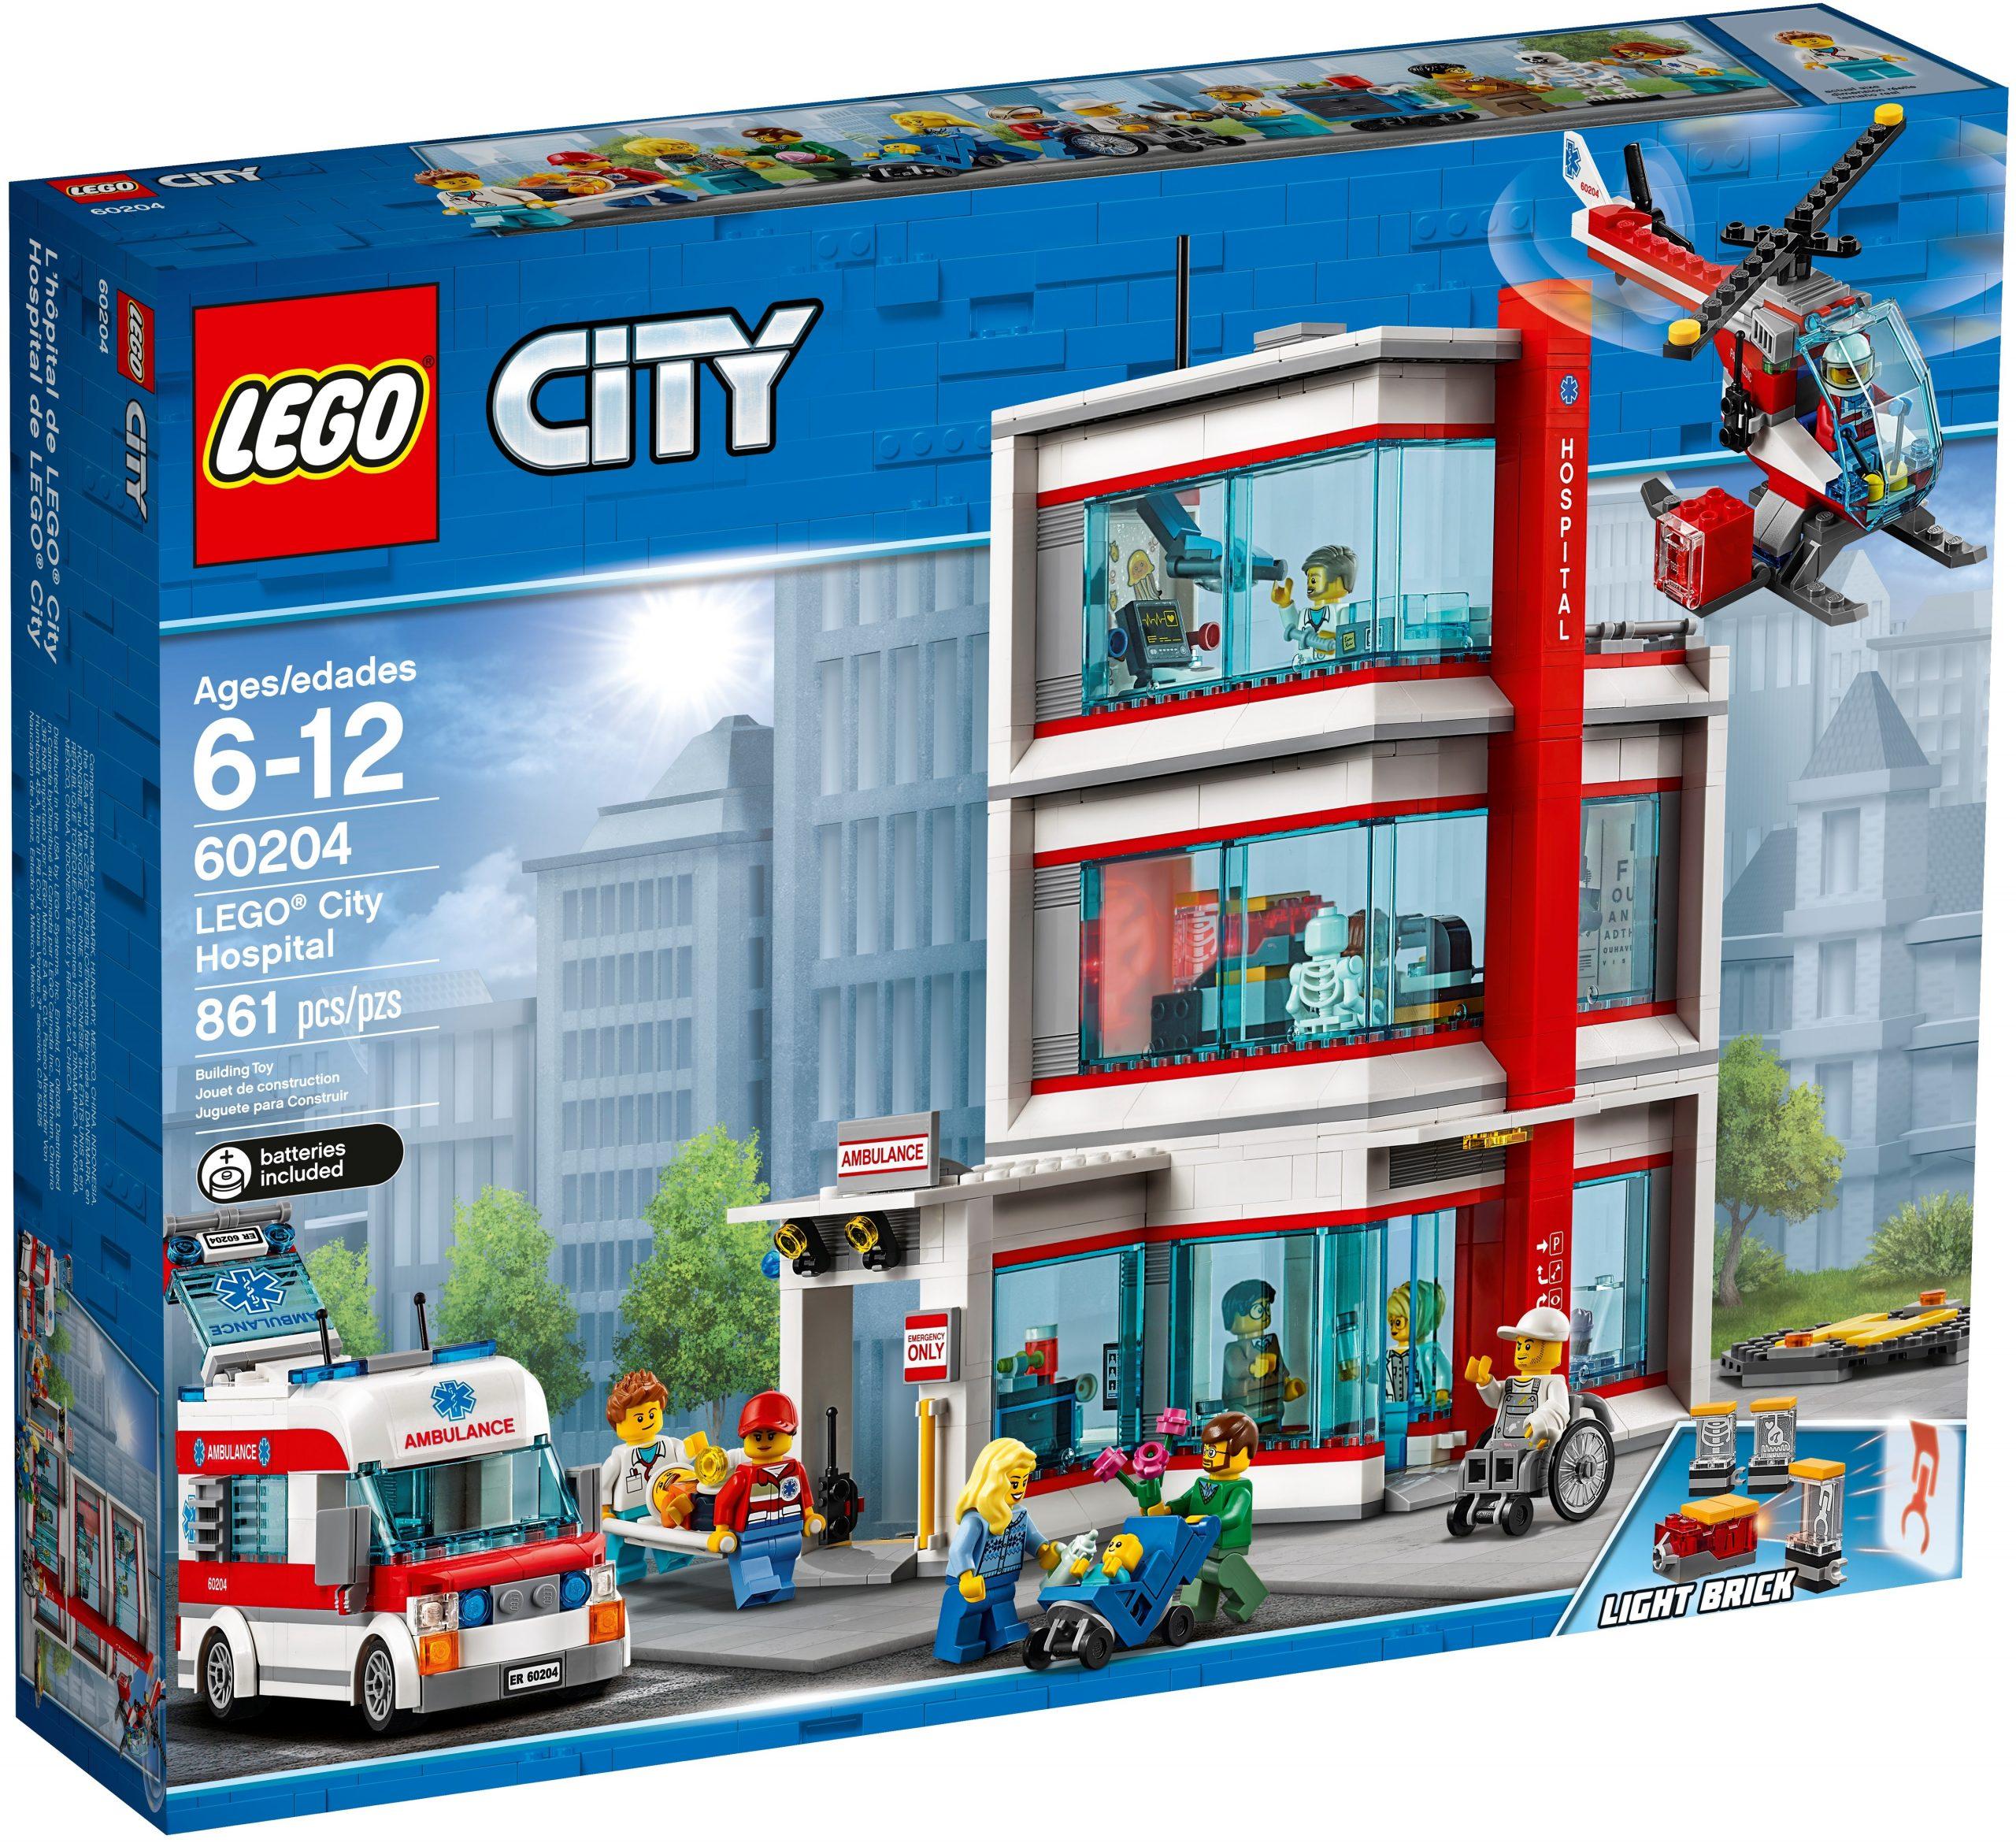 ospedale di lego 60204 city scaled